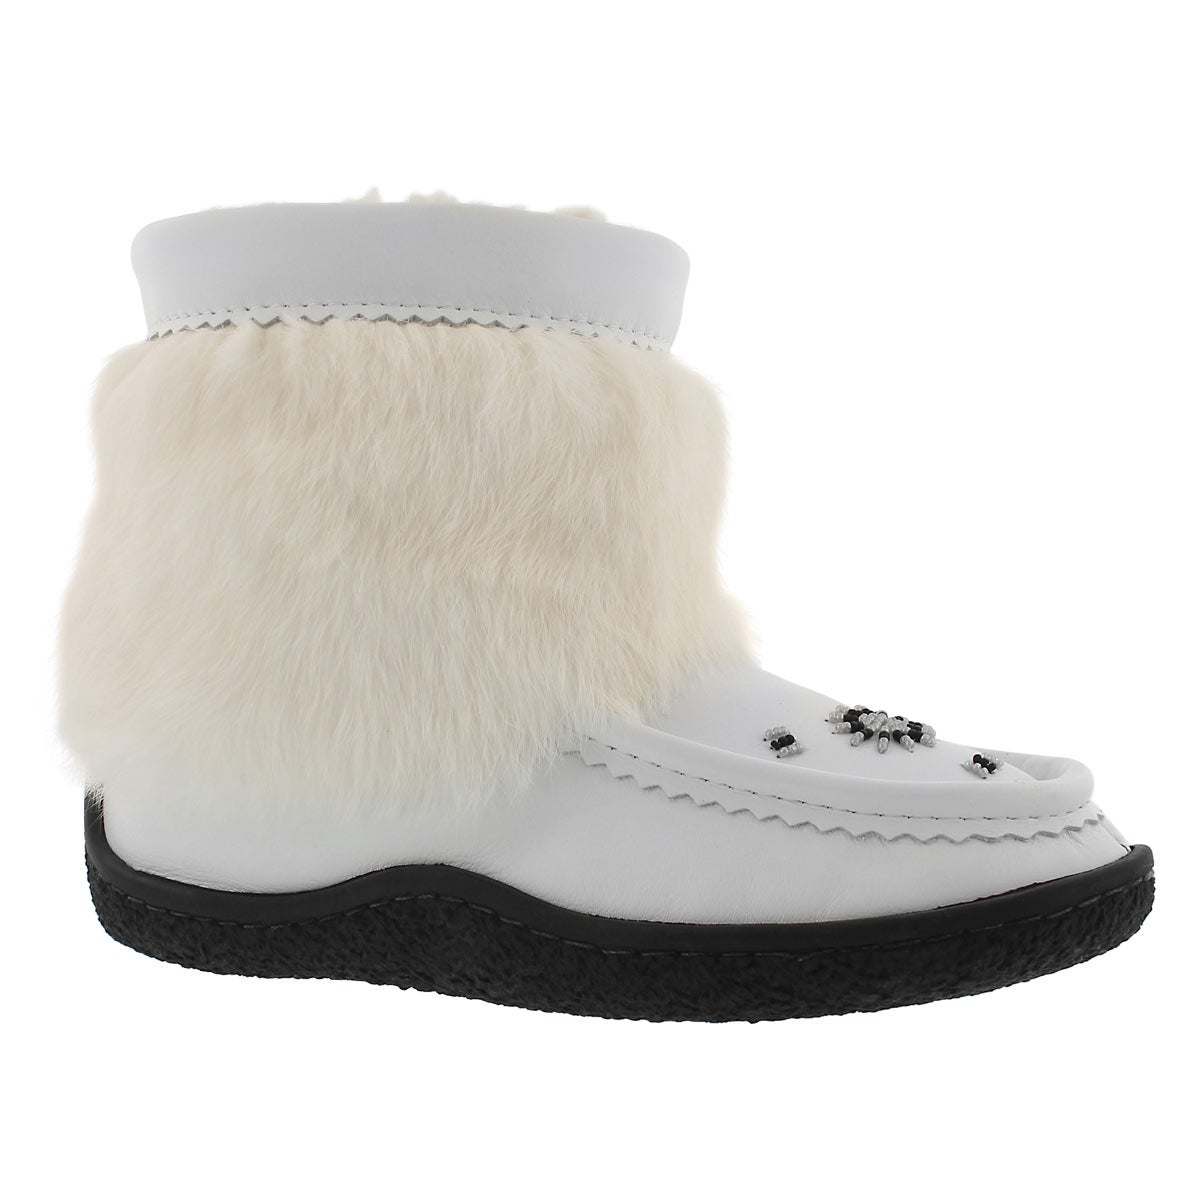 Women's MINIMUK white leather rabbit fur booties